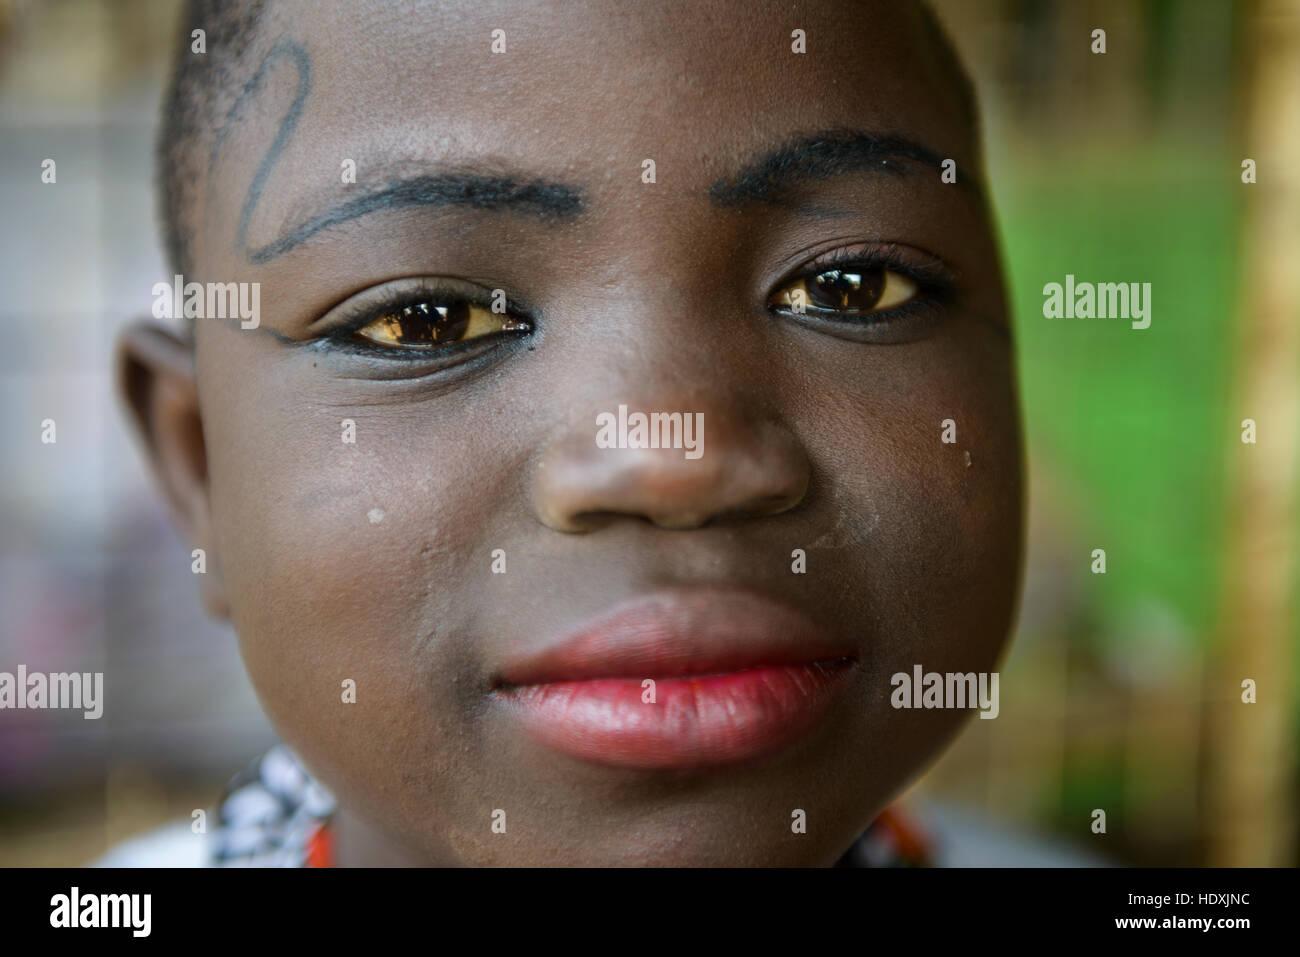 Portraits of Ghanaian girls - Stock Image